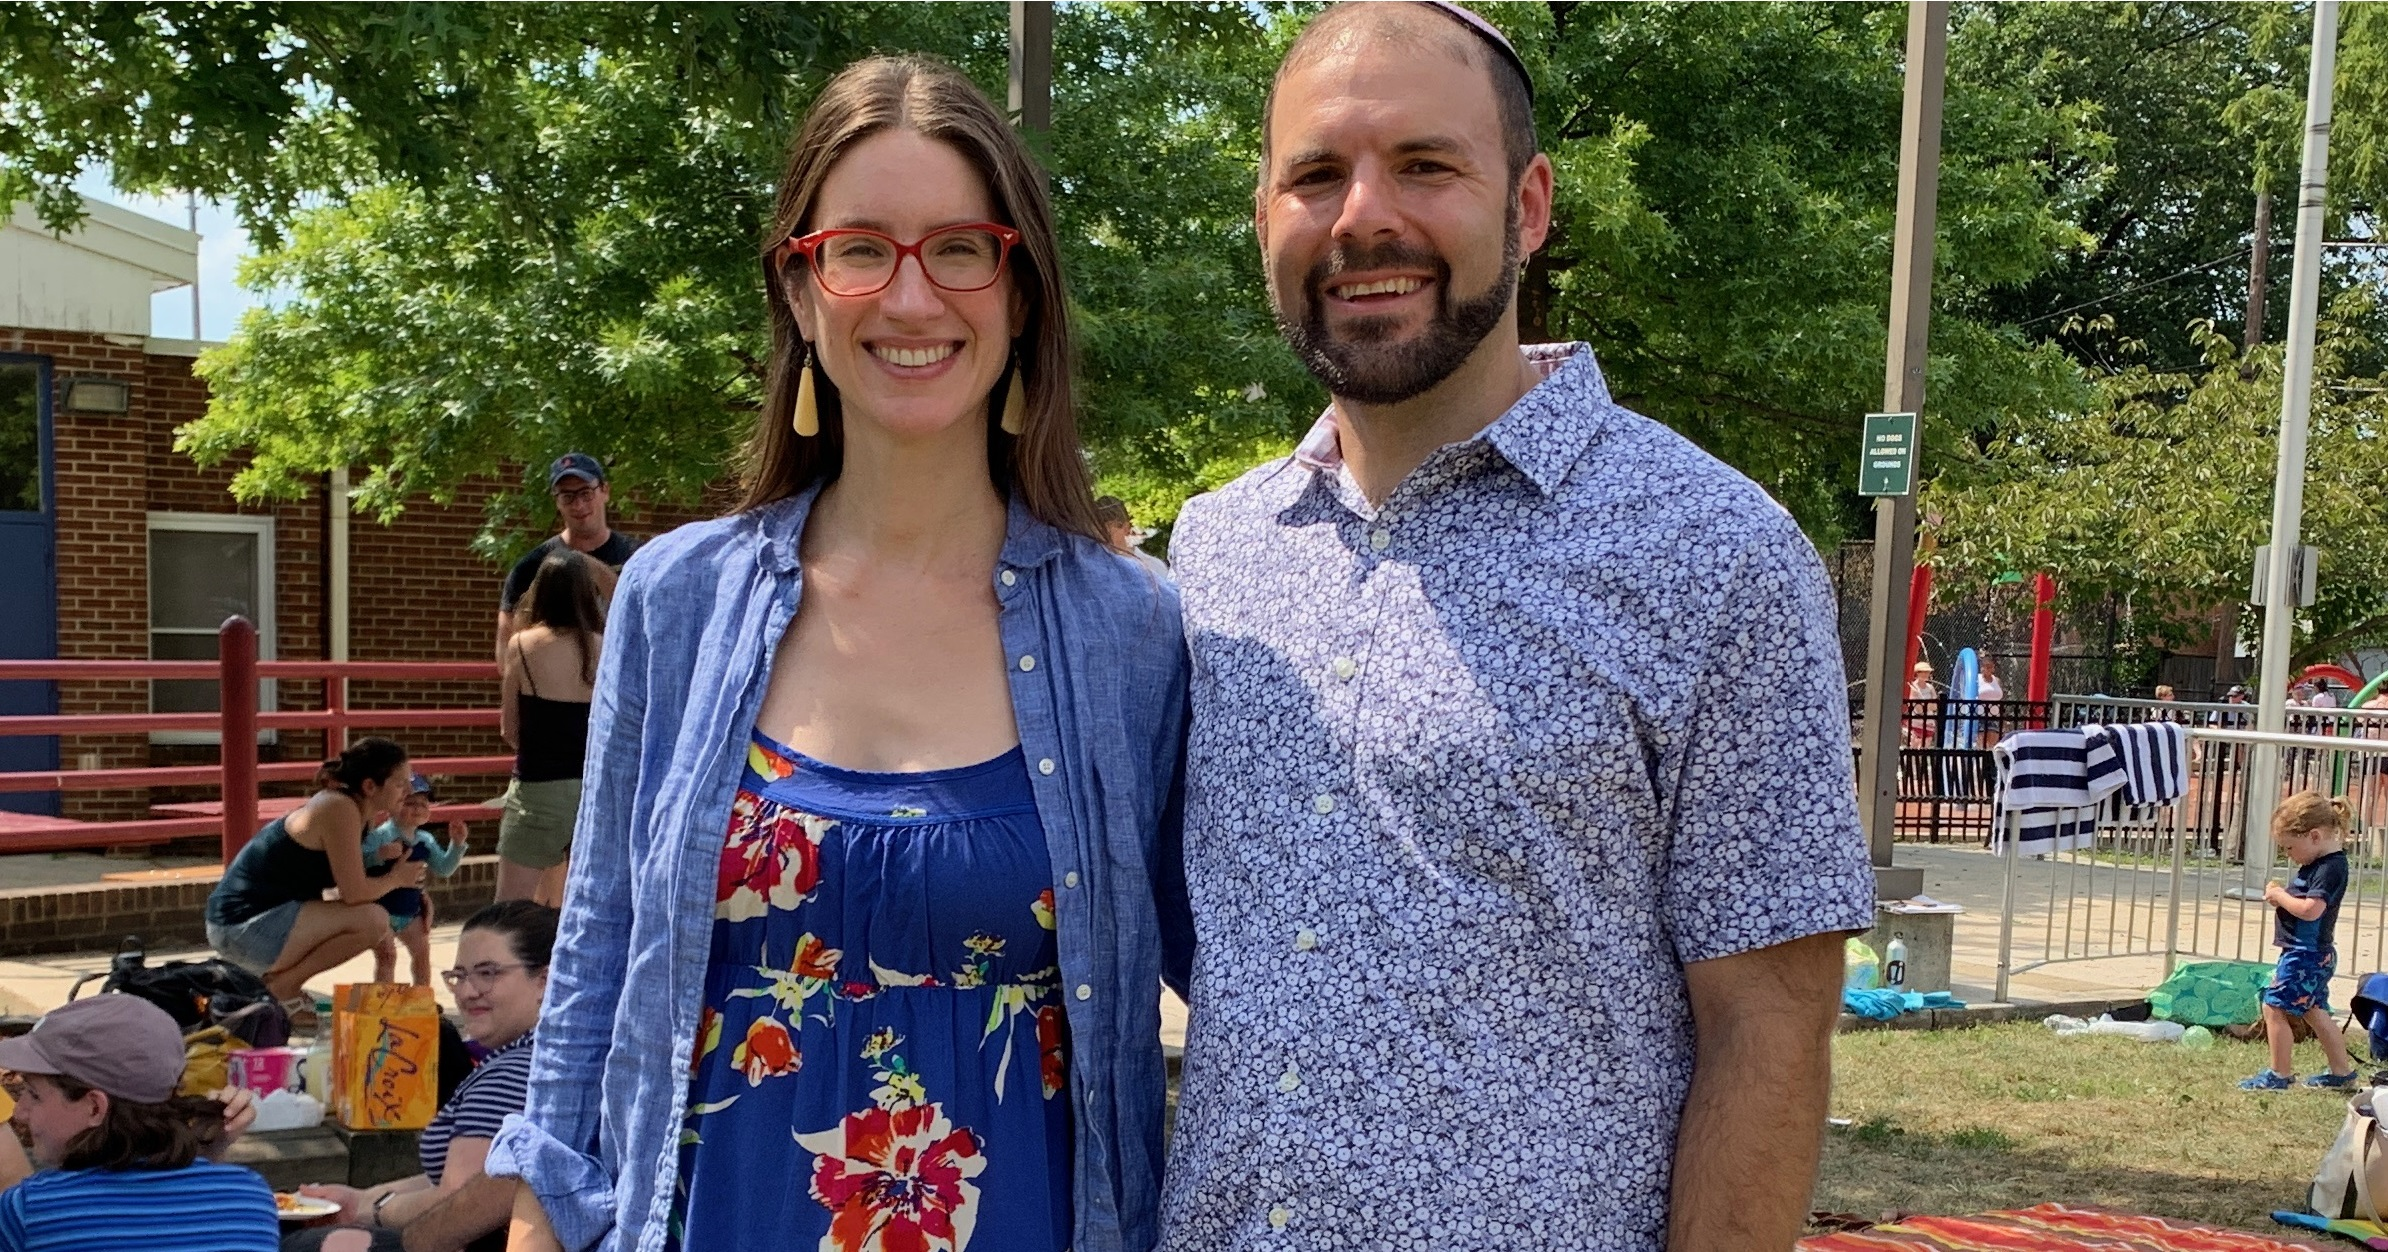 Episode 181: The New Synagogue Project - Joseph Berman, Lauren Spokane